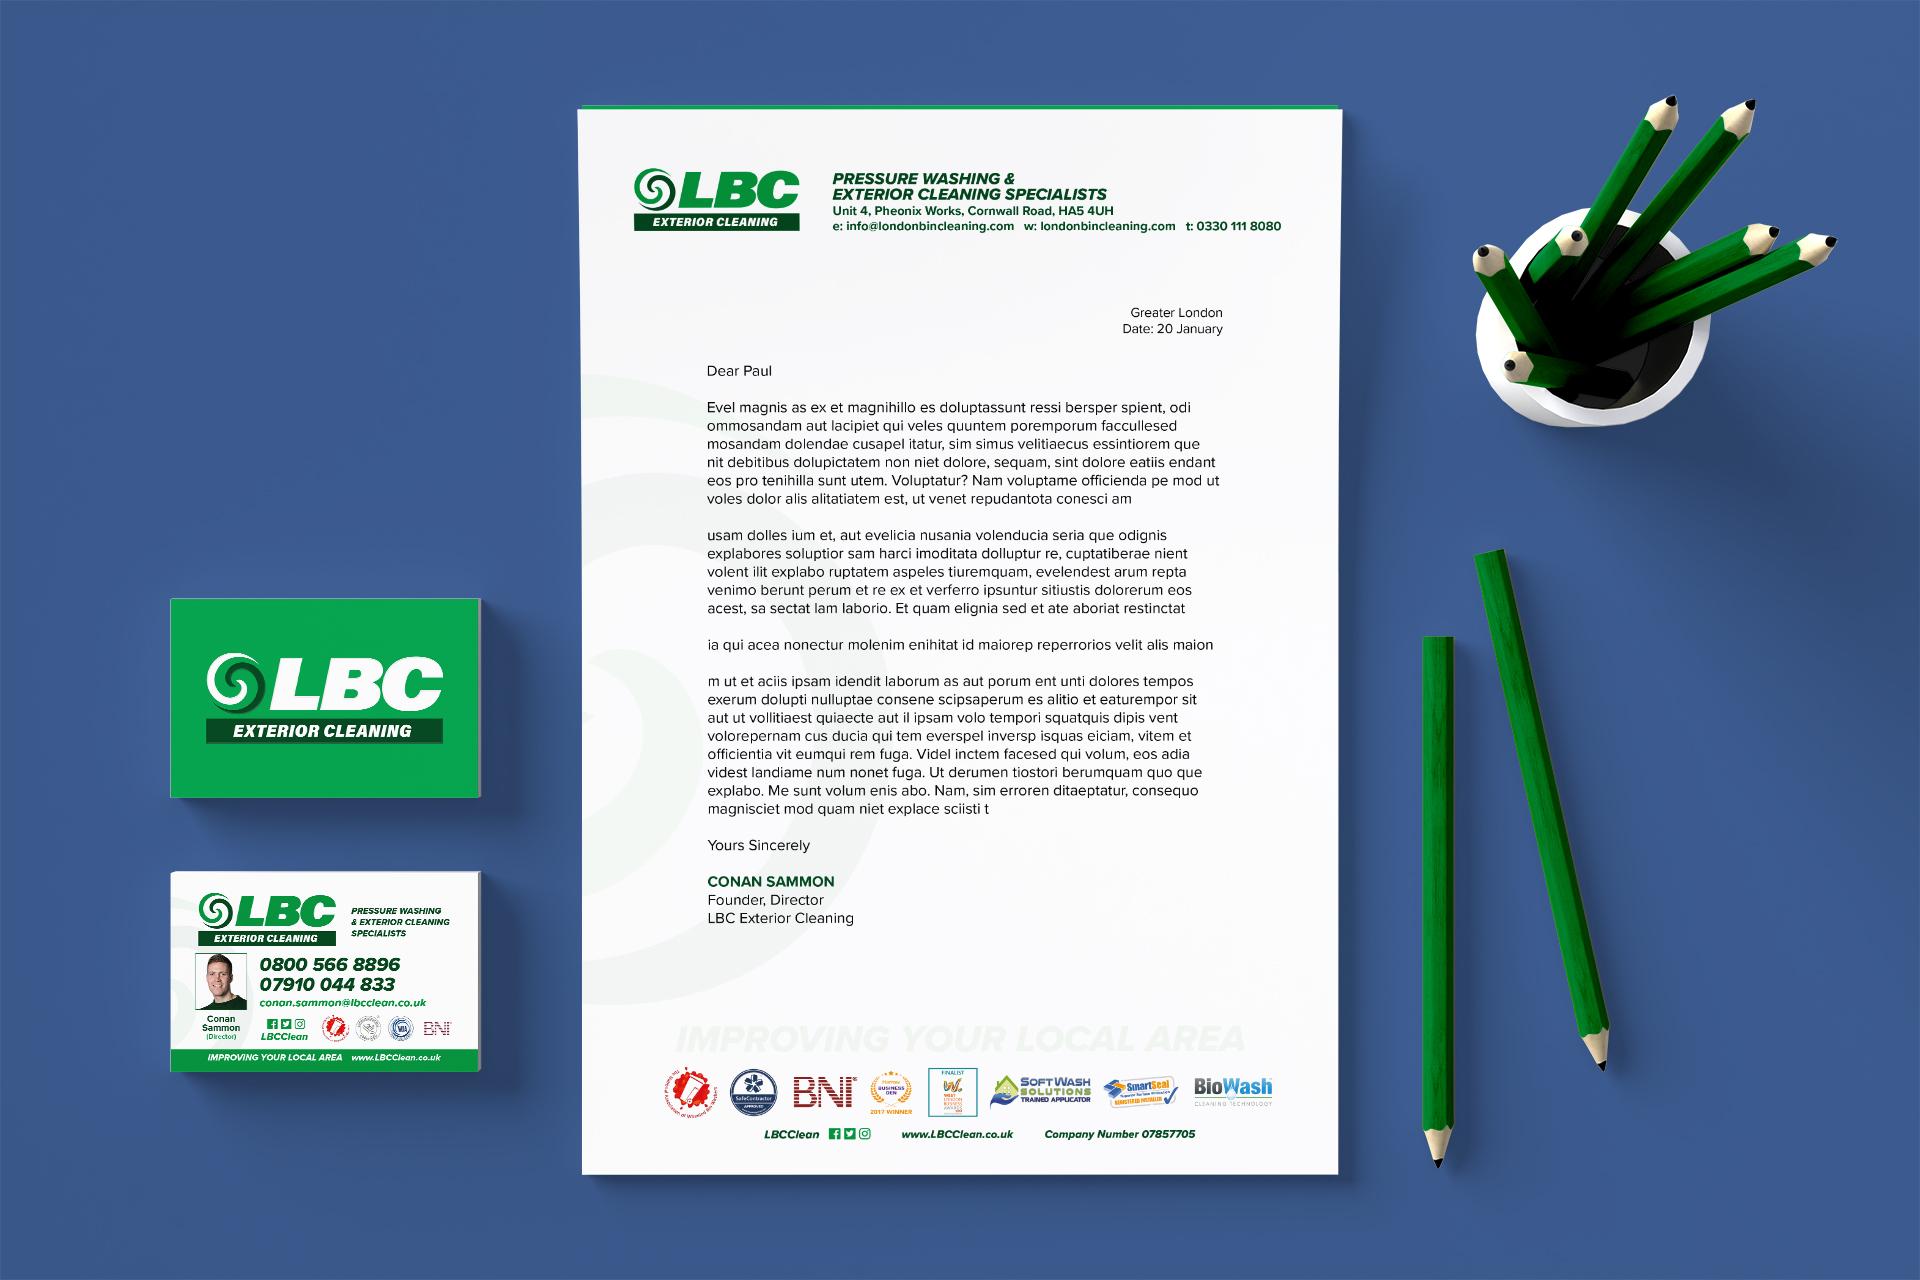 LBC stationery design image